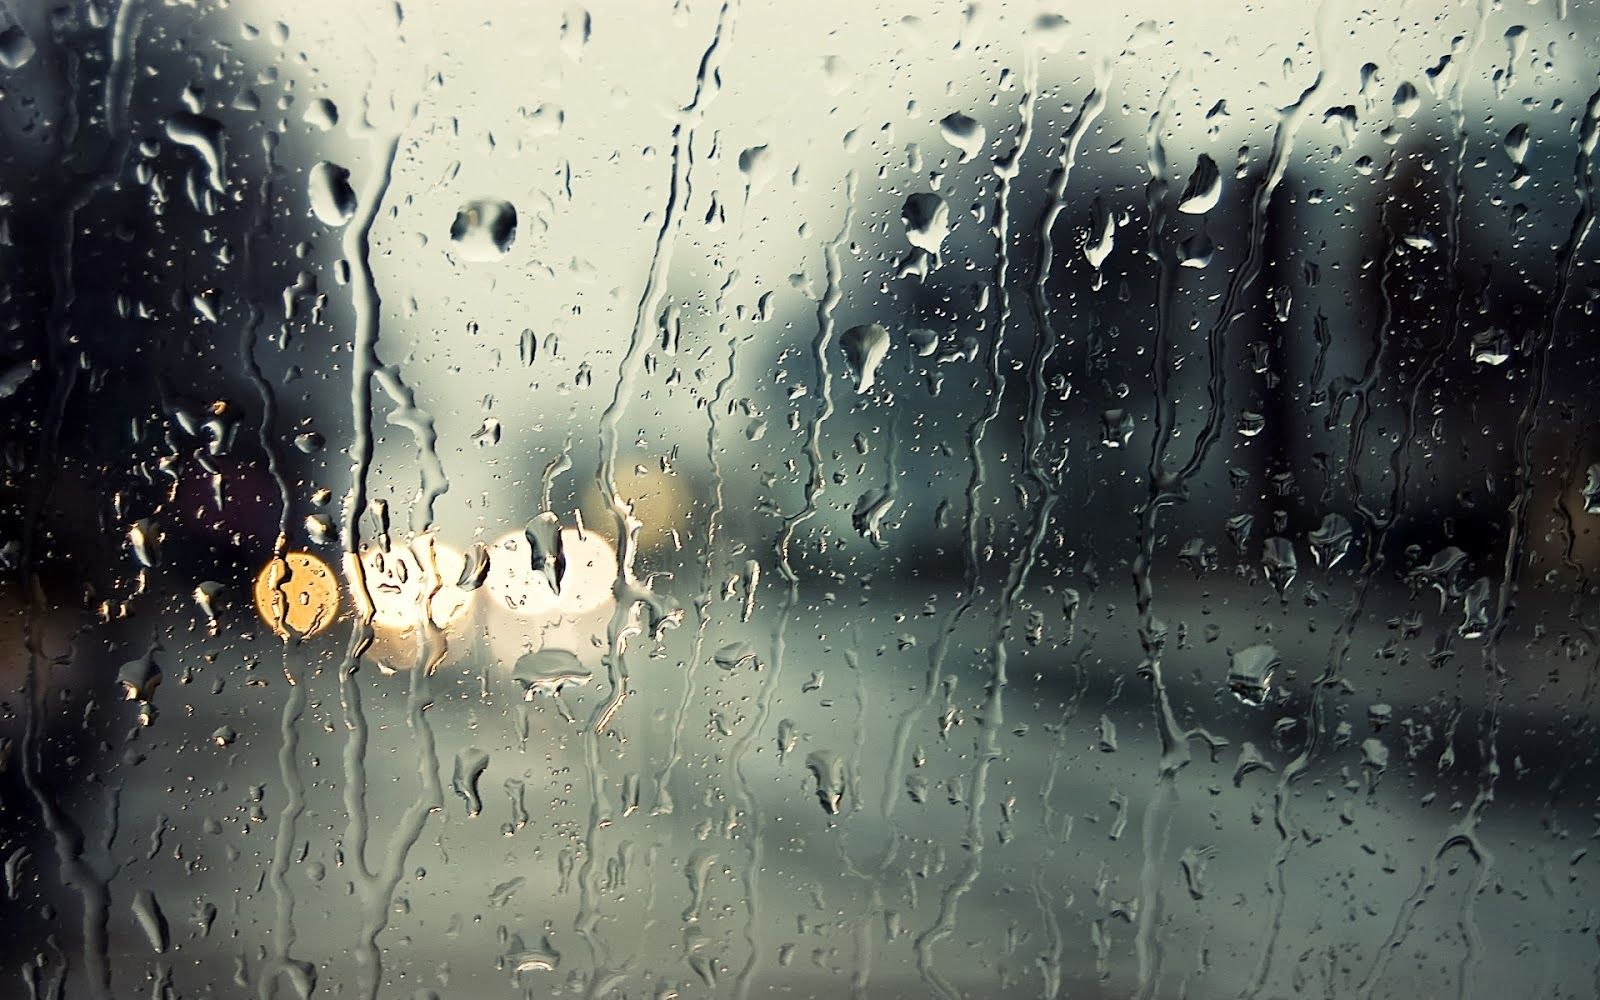 Hujan Gradasi Dengan Gambar